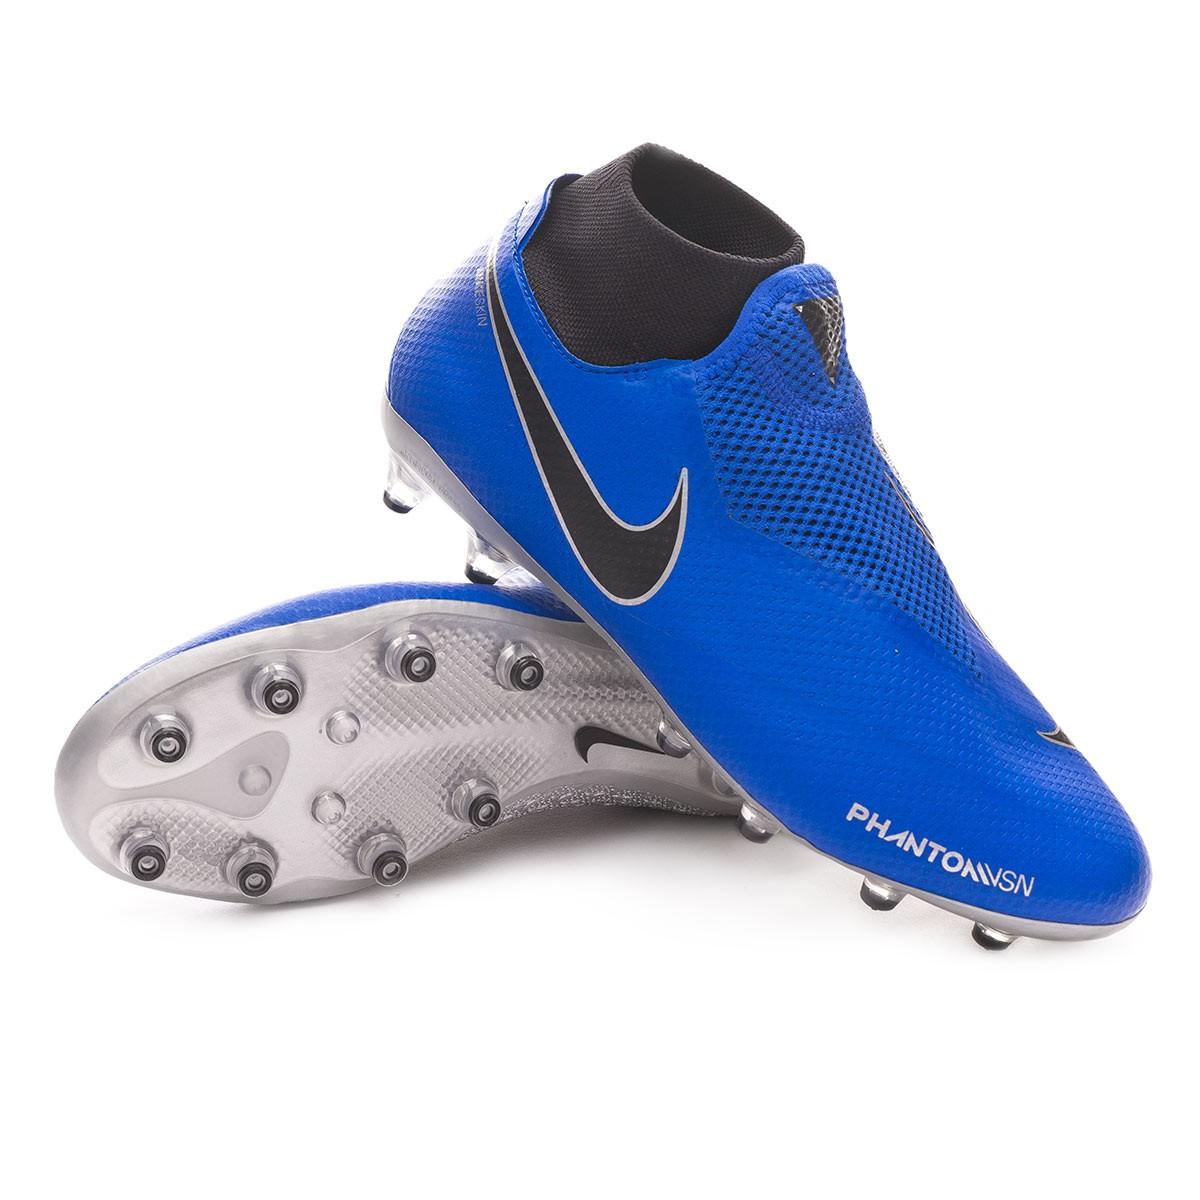 912170e3c7d Football Boots Nike Phantom Vision Pro DF AG-Pro Racer blue-Black ...